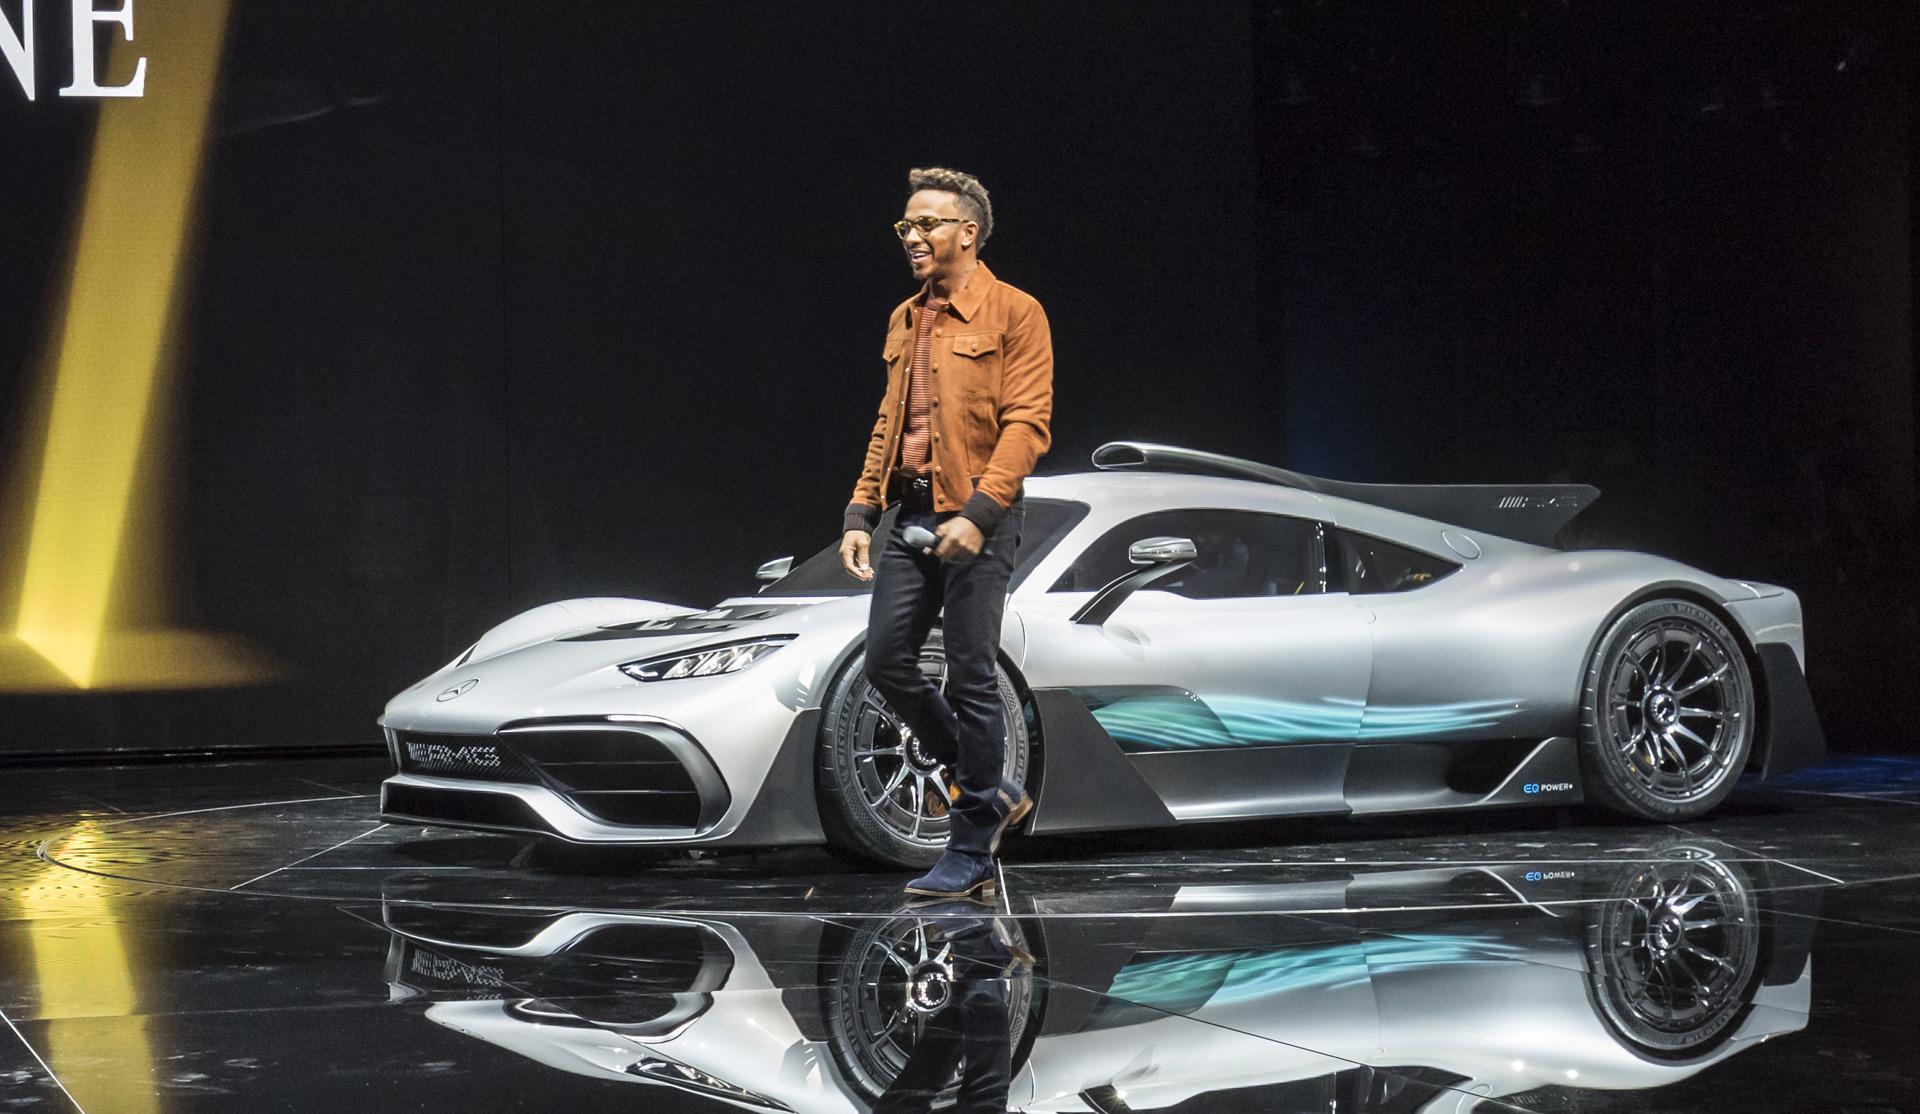 dd2aaea49db Lewis Hamilton wants to build a Mercedes-AMG One LH Edition